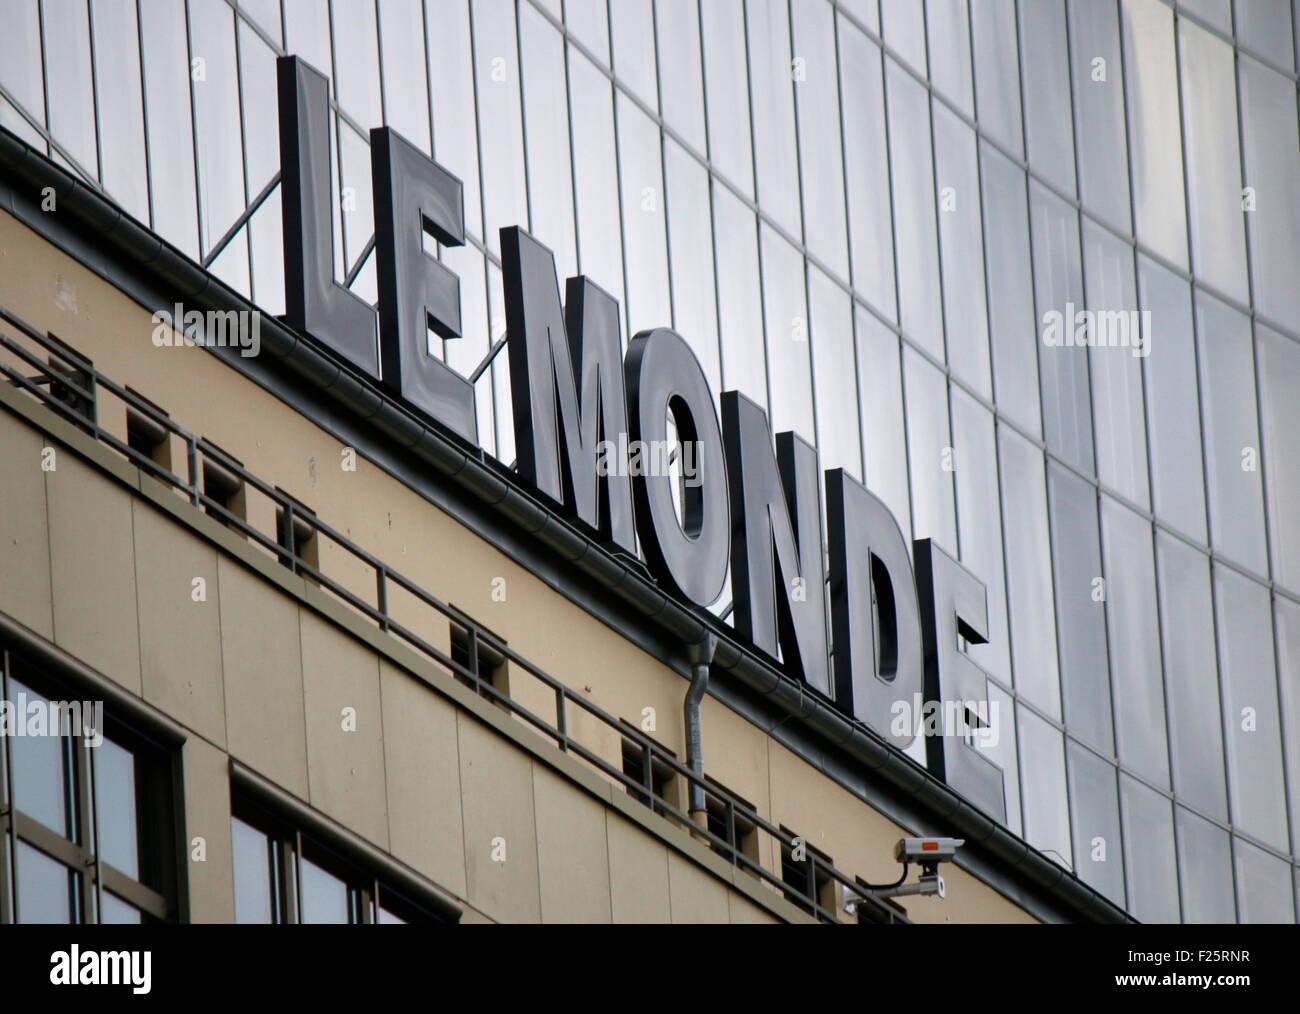 Markennamen: 'Le Monde', Berlin. - Stock Image